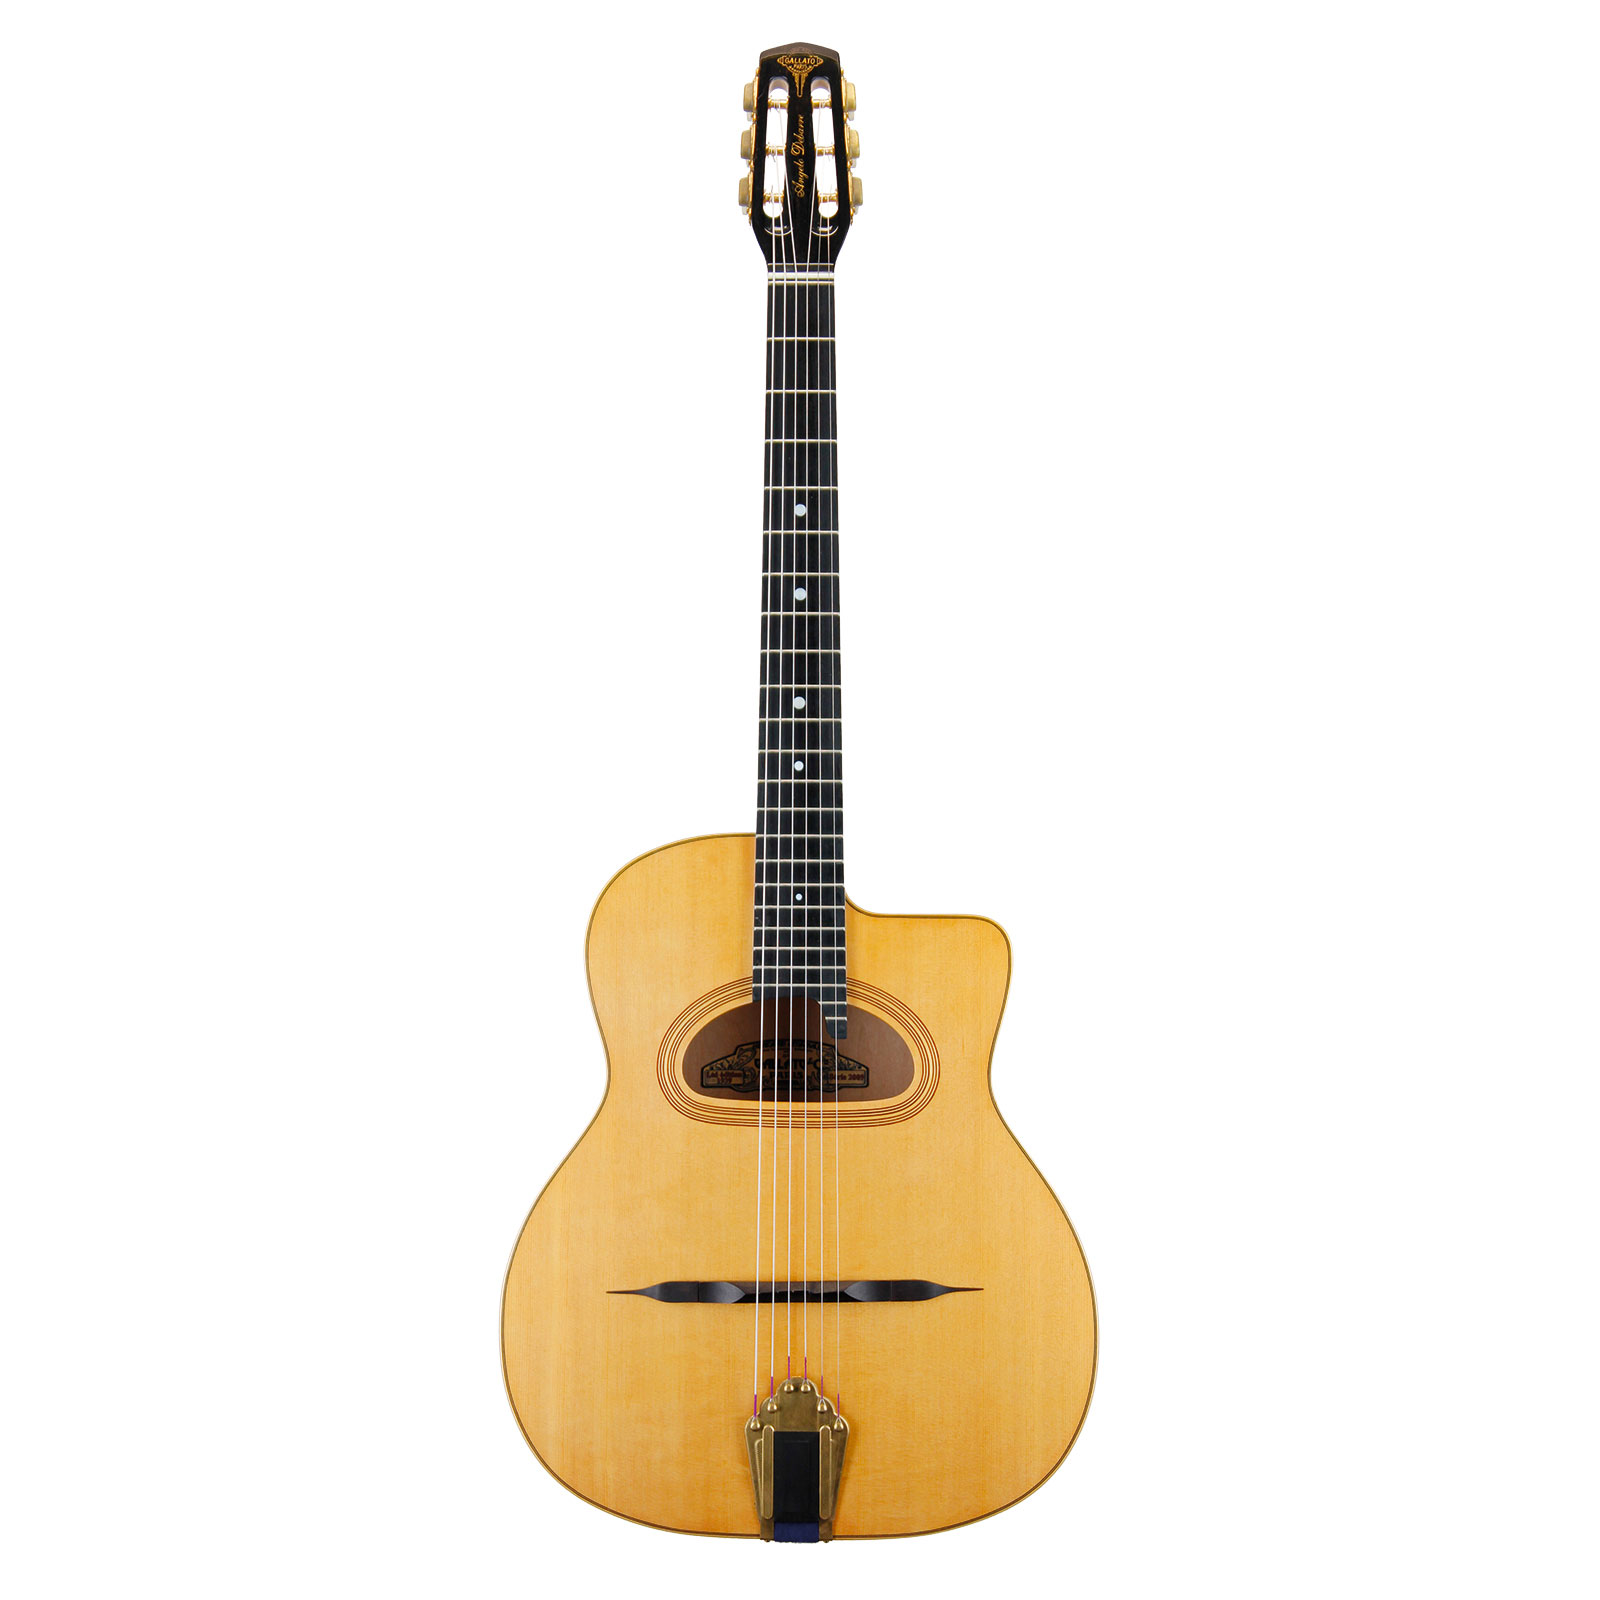 gallato rs 1939 bouche en d angelo debarre erable guitar buy online free. Black Bedroom Furniture Sets. Home Design Ideas